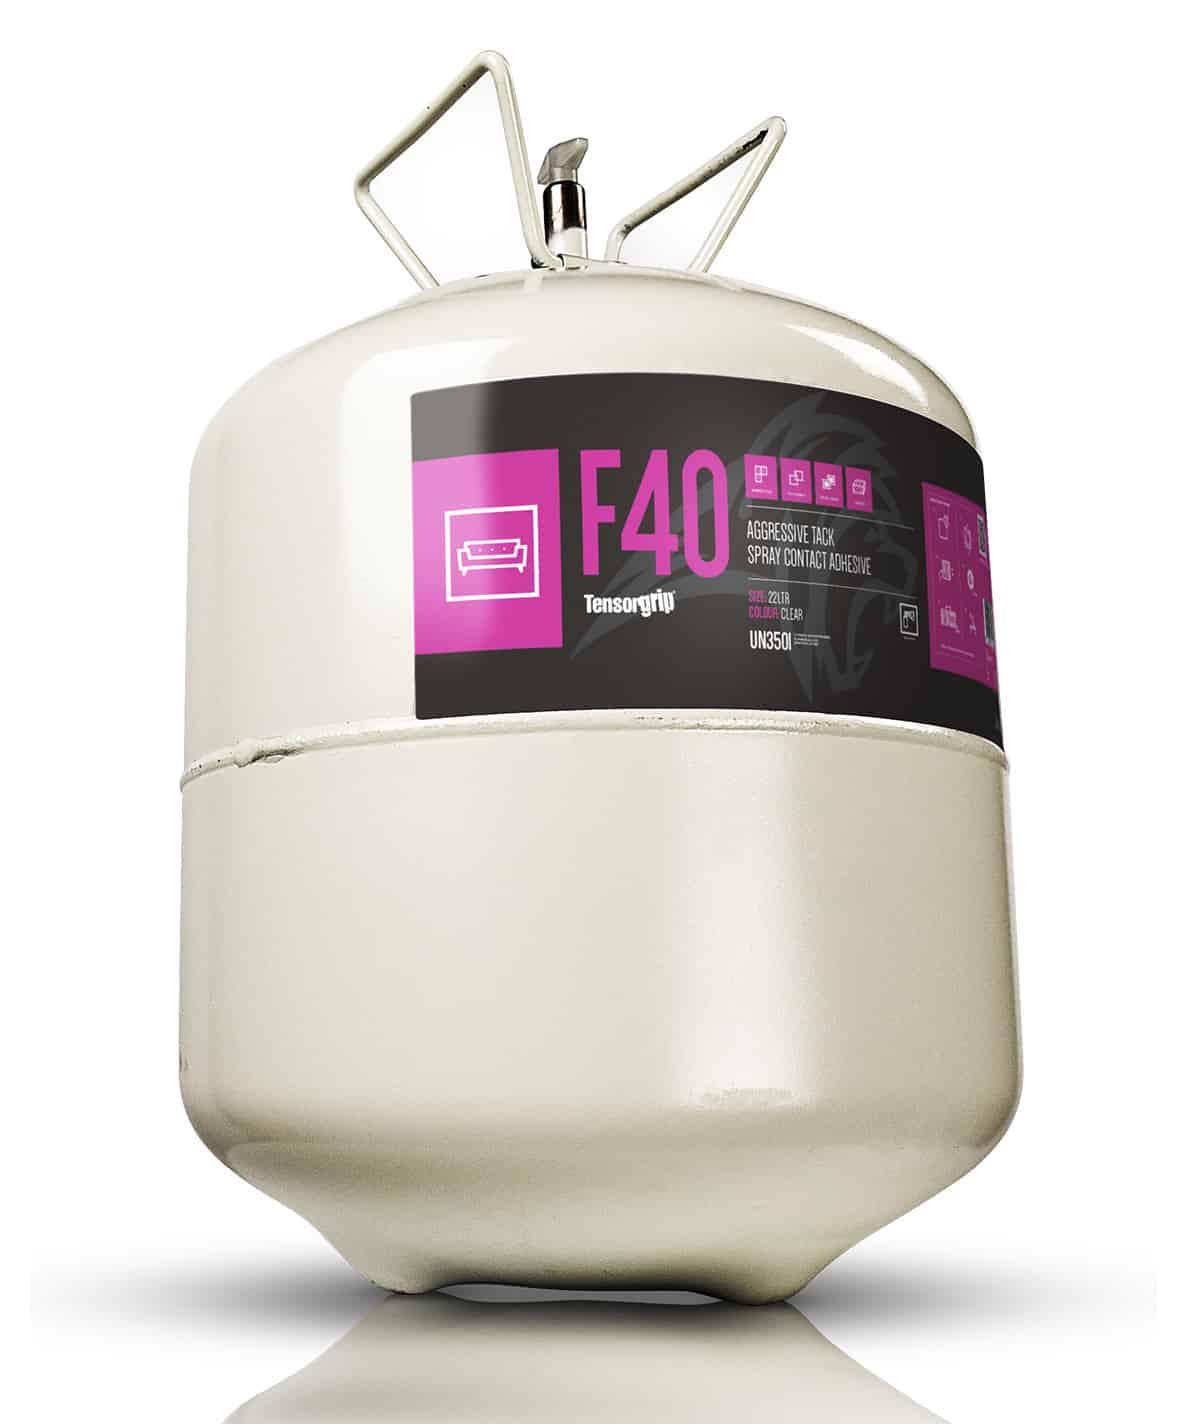 Tensorgrip F40 Adhesive